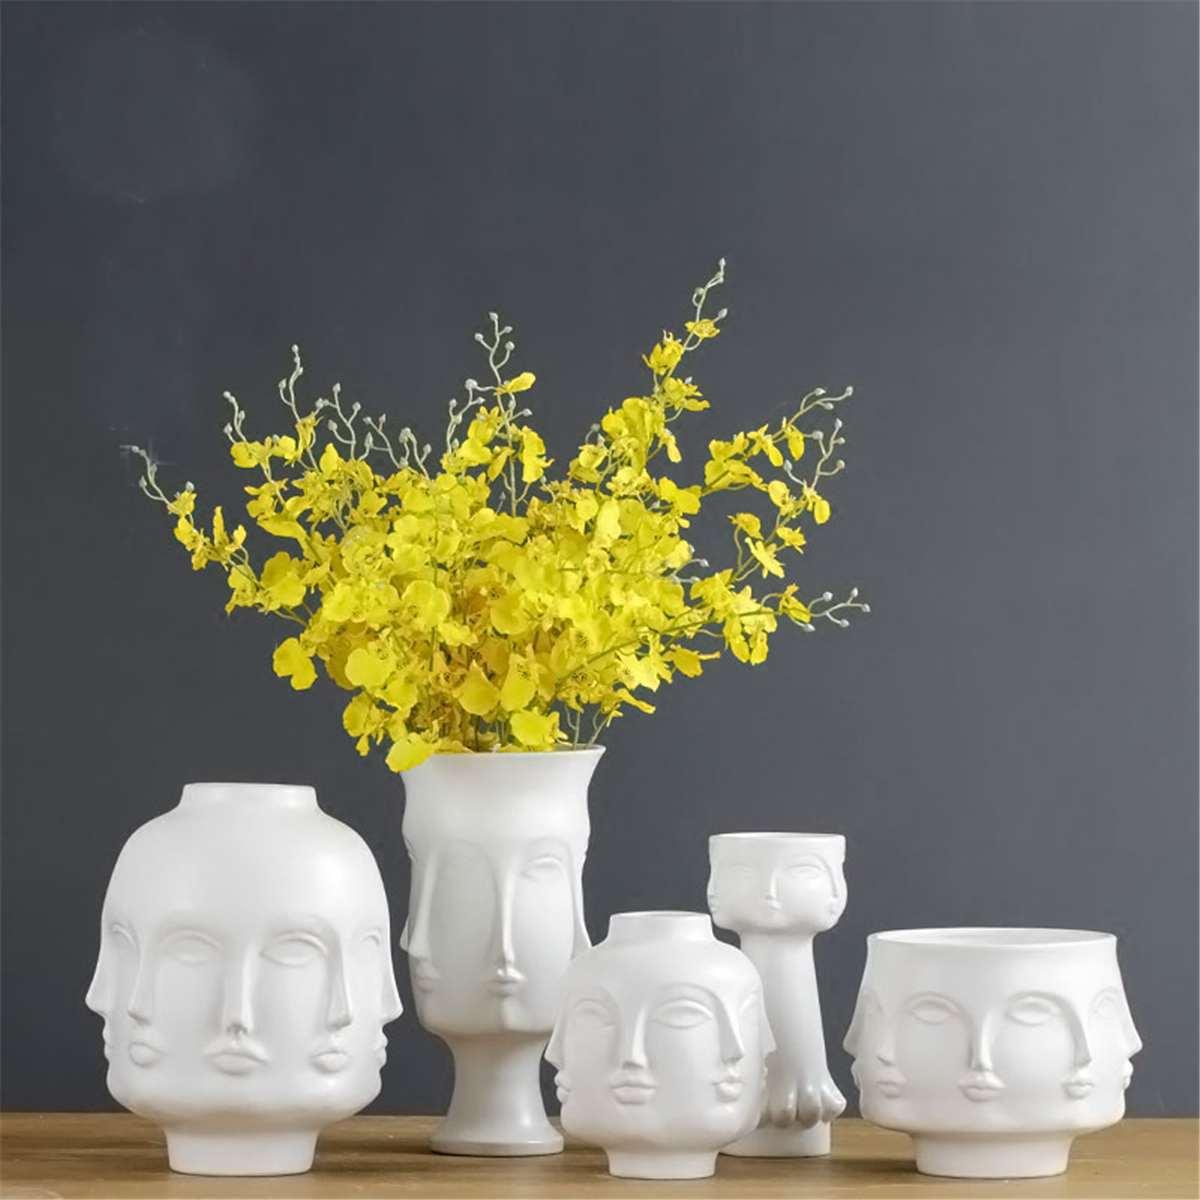 Ceramic Abstract Vase White Human Face Vases Nordic Minimalist Figure Head Shape Vase Display Room Decorative Flower Ornament